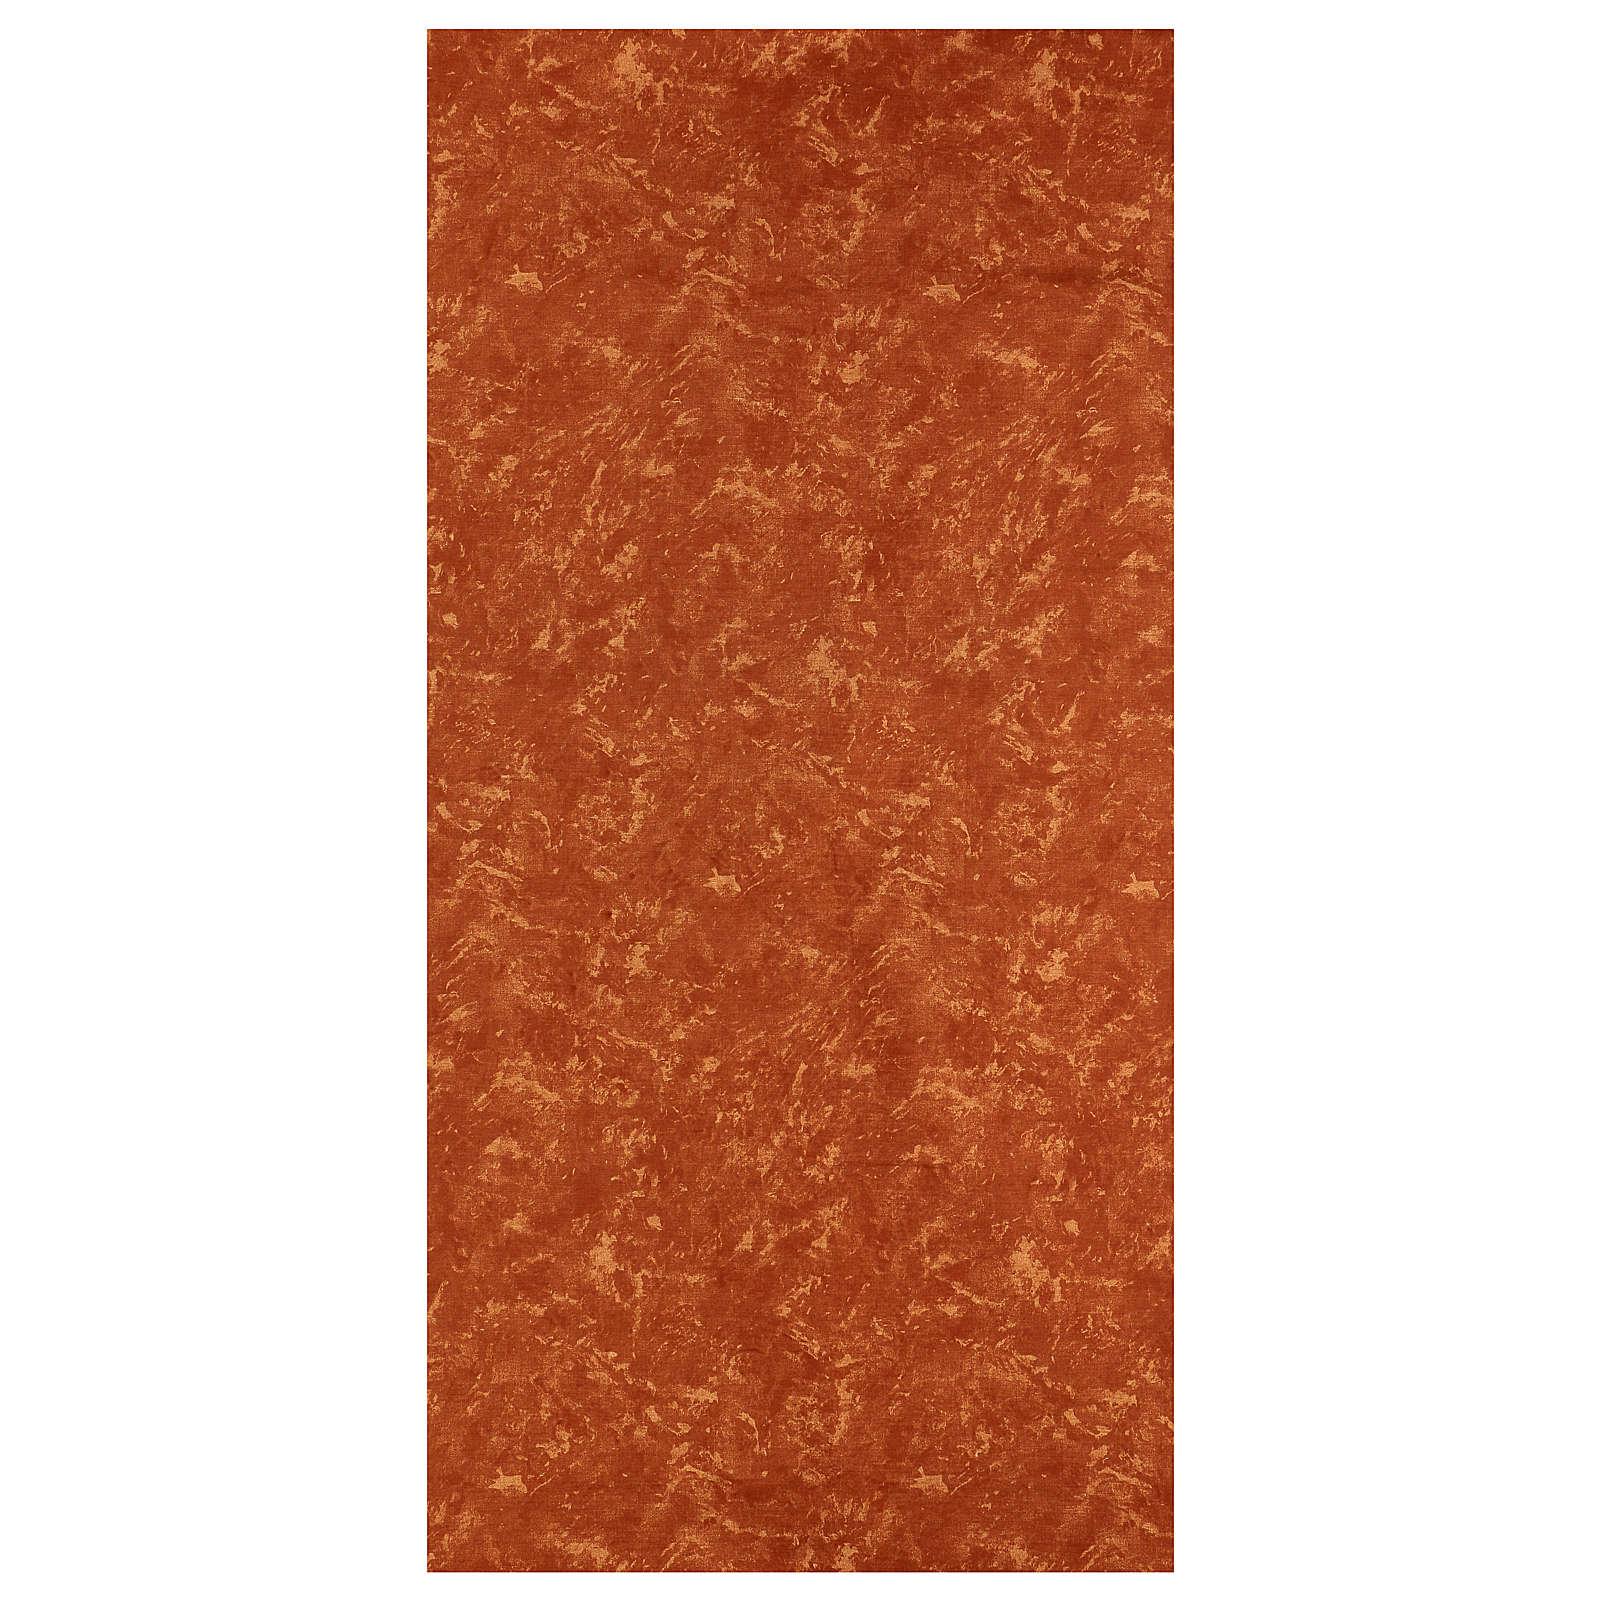 Papel tierra roja 120x60 cm modelable para belenes 4